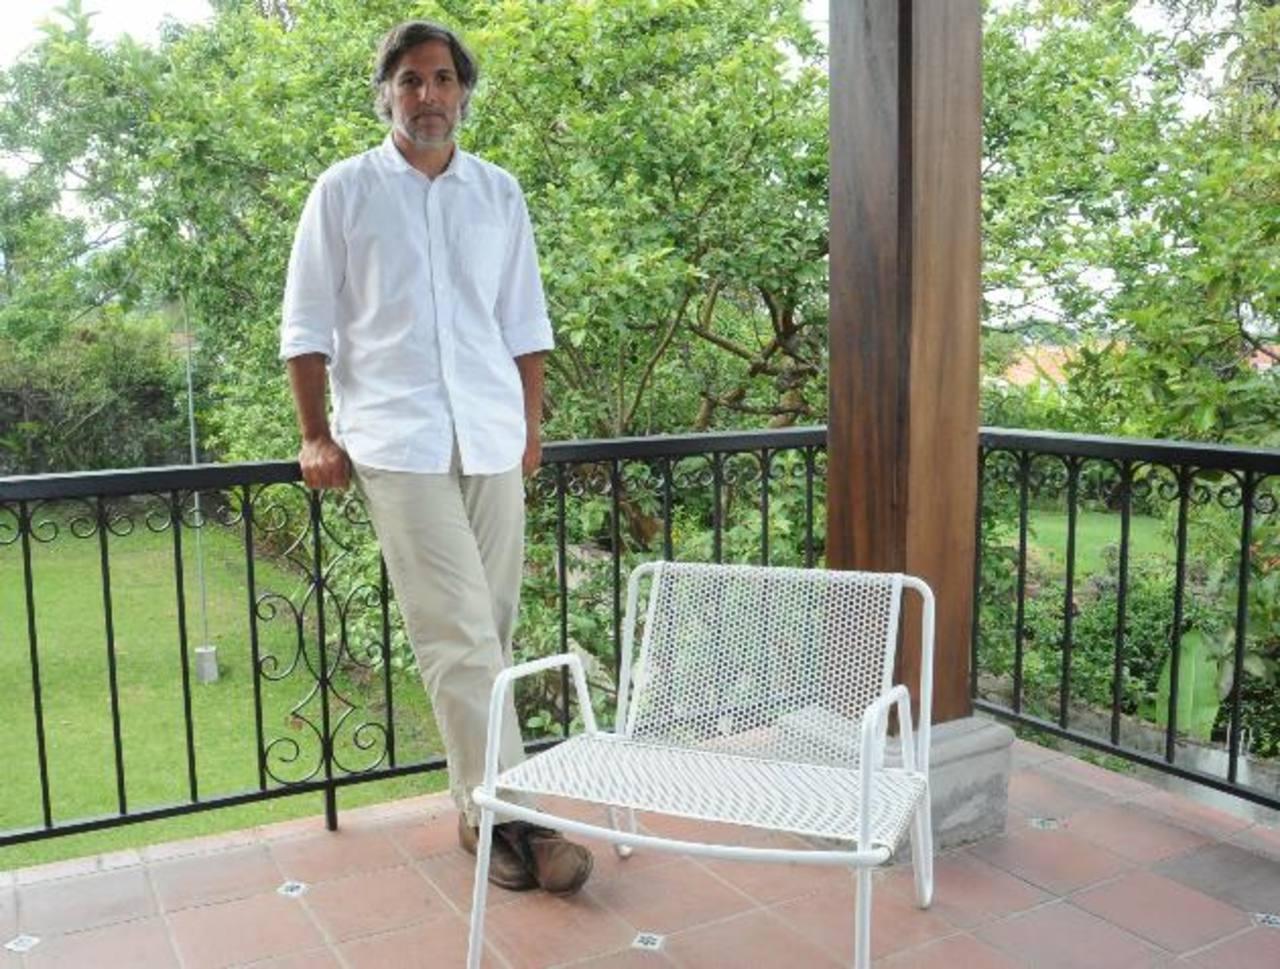 Javier Cristiani Y Su Exquisita Producci N De Muebles Elsalvador Com # Muebles Lissette